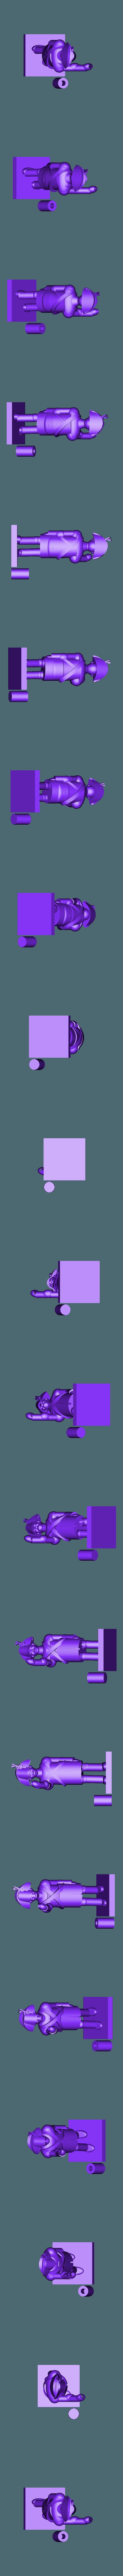 aus_art_man2_2.stl Download free STL file Napoleonics - Part 14 - Austrian Gun Crew • 3D printing design, Earsling